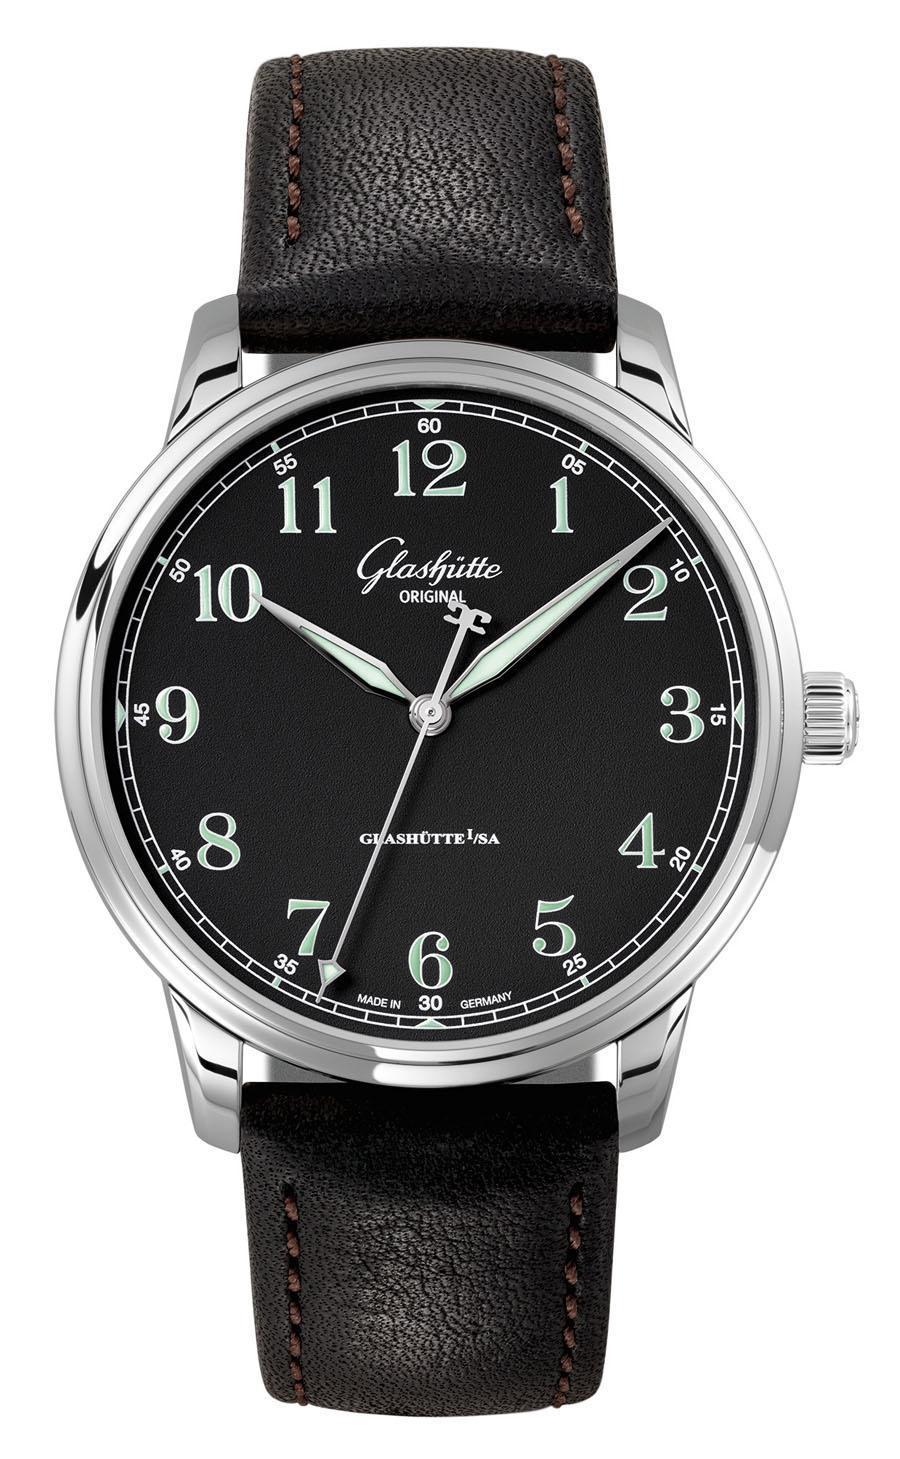 Glashütte Original: Senator Excellence im Stil einer Beobachter-Uhr